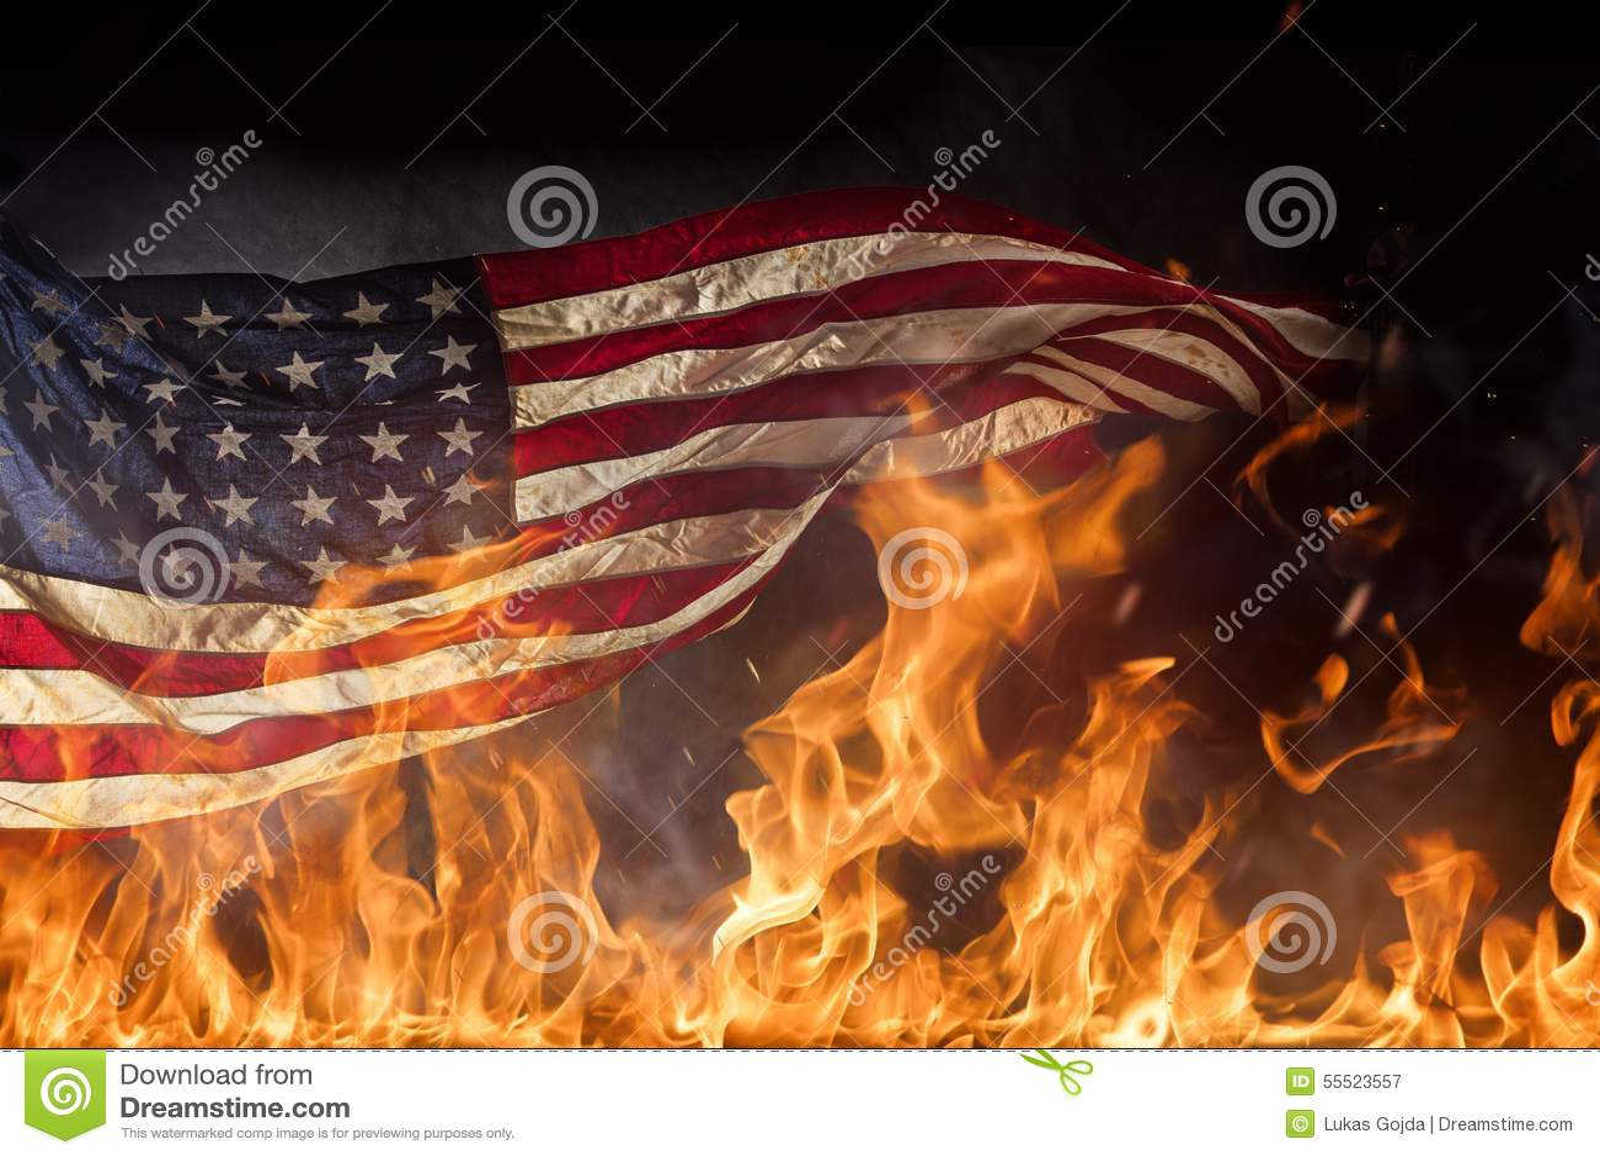 essay on american flag burning